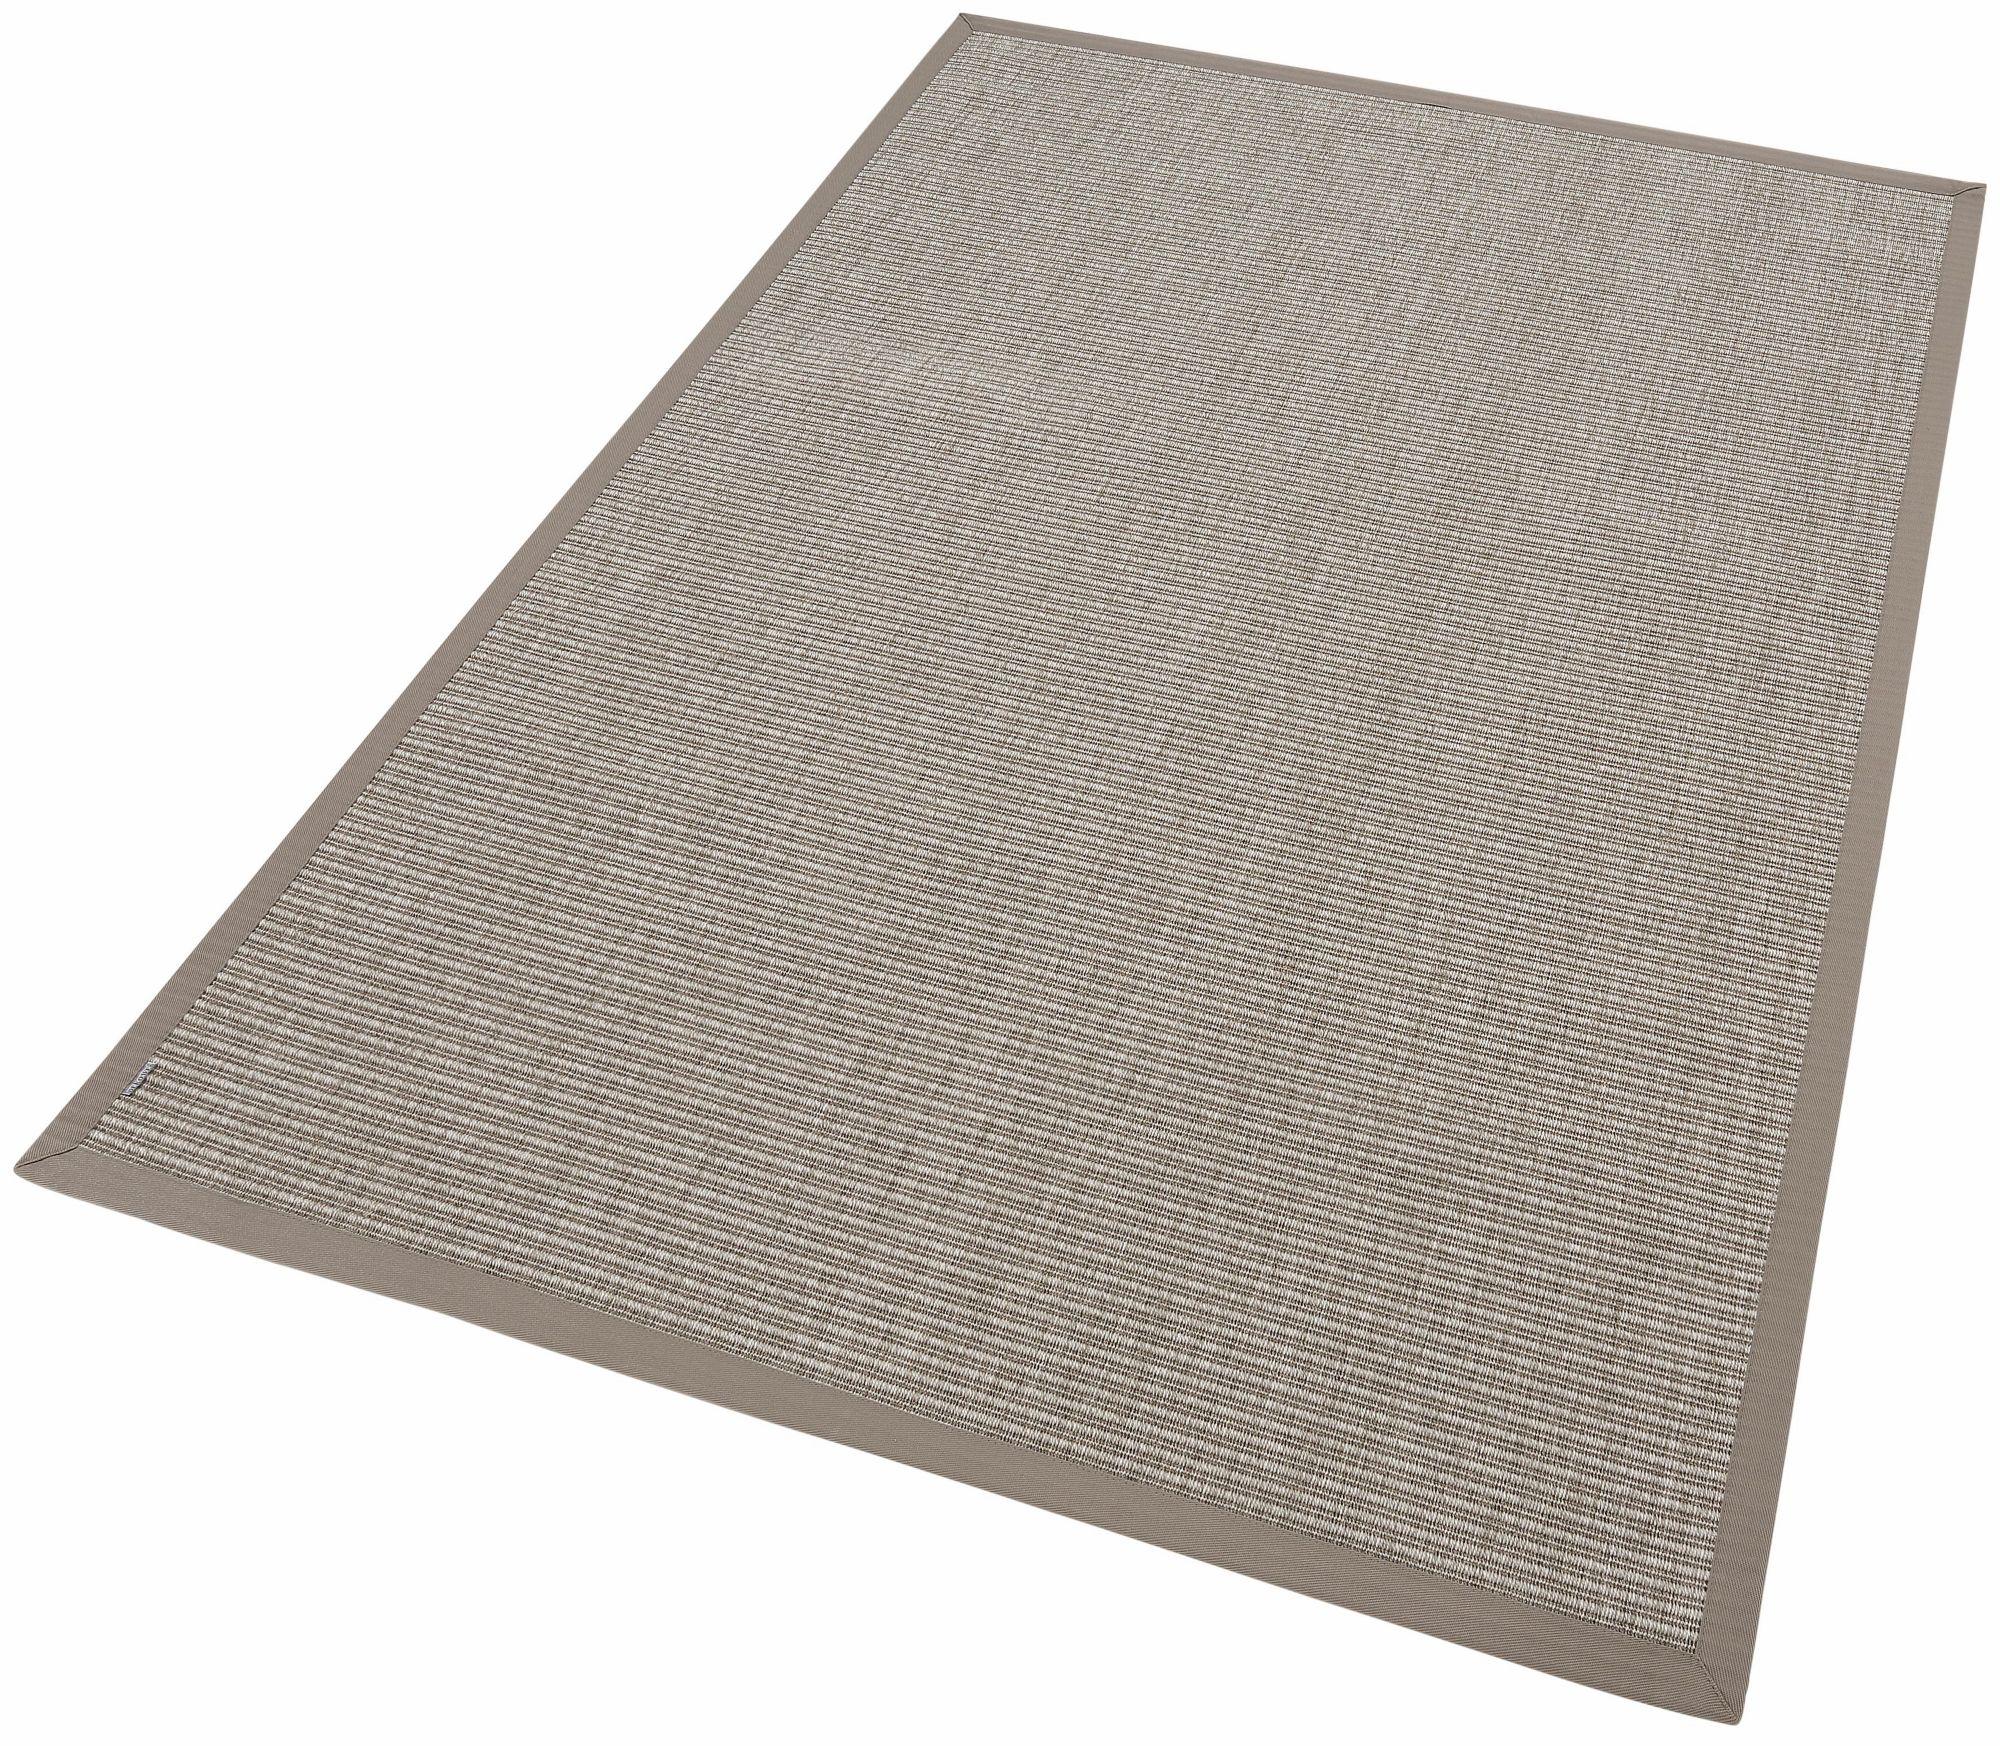 DEKOWE Teppich, Dekowe, »Naturino Tweed«, Melange-Effekt, Sisaloptik, Wunschmaß